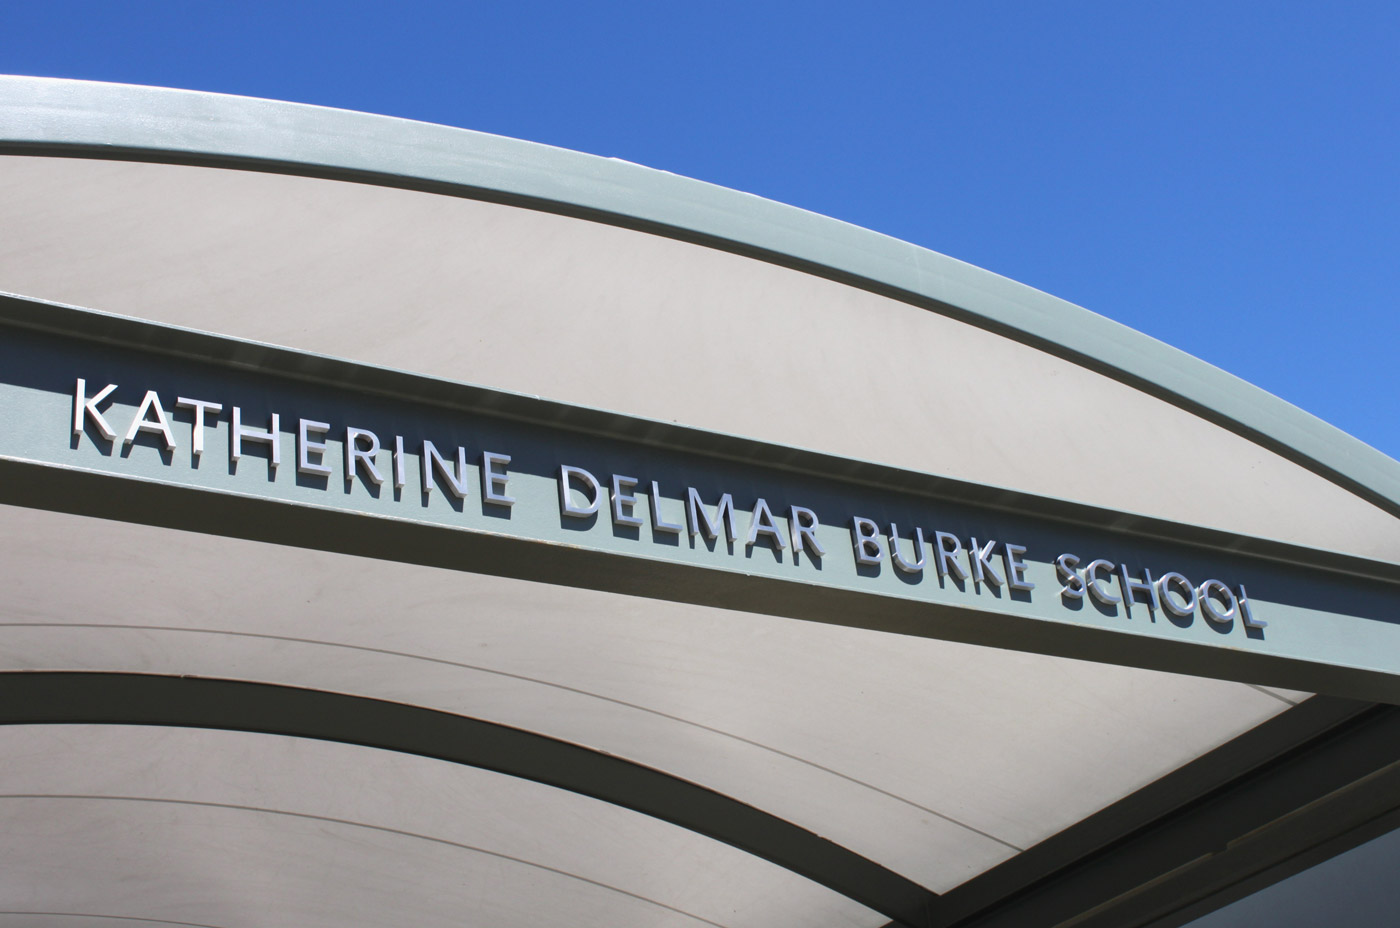 Katherine Delmar Burke School Signage